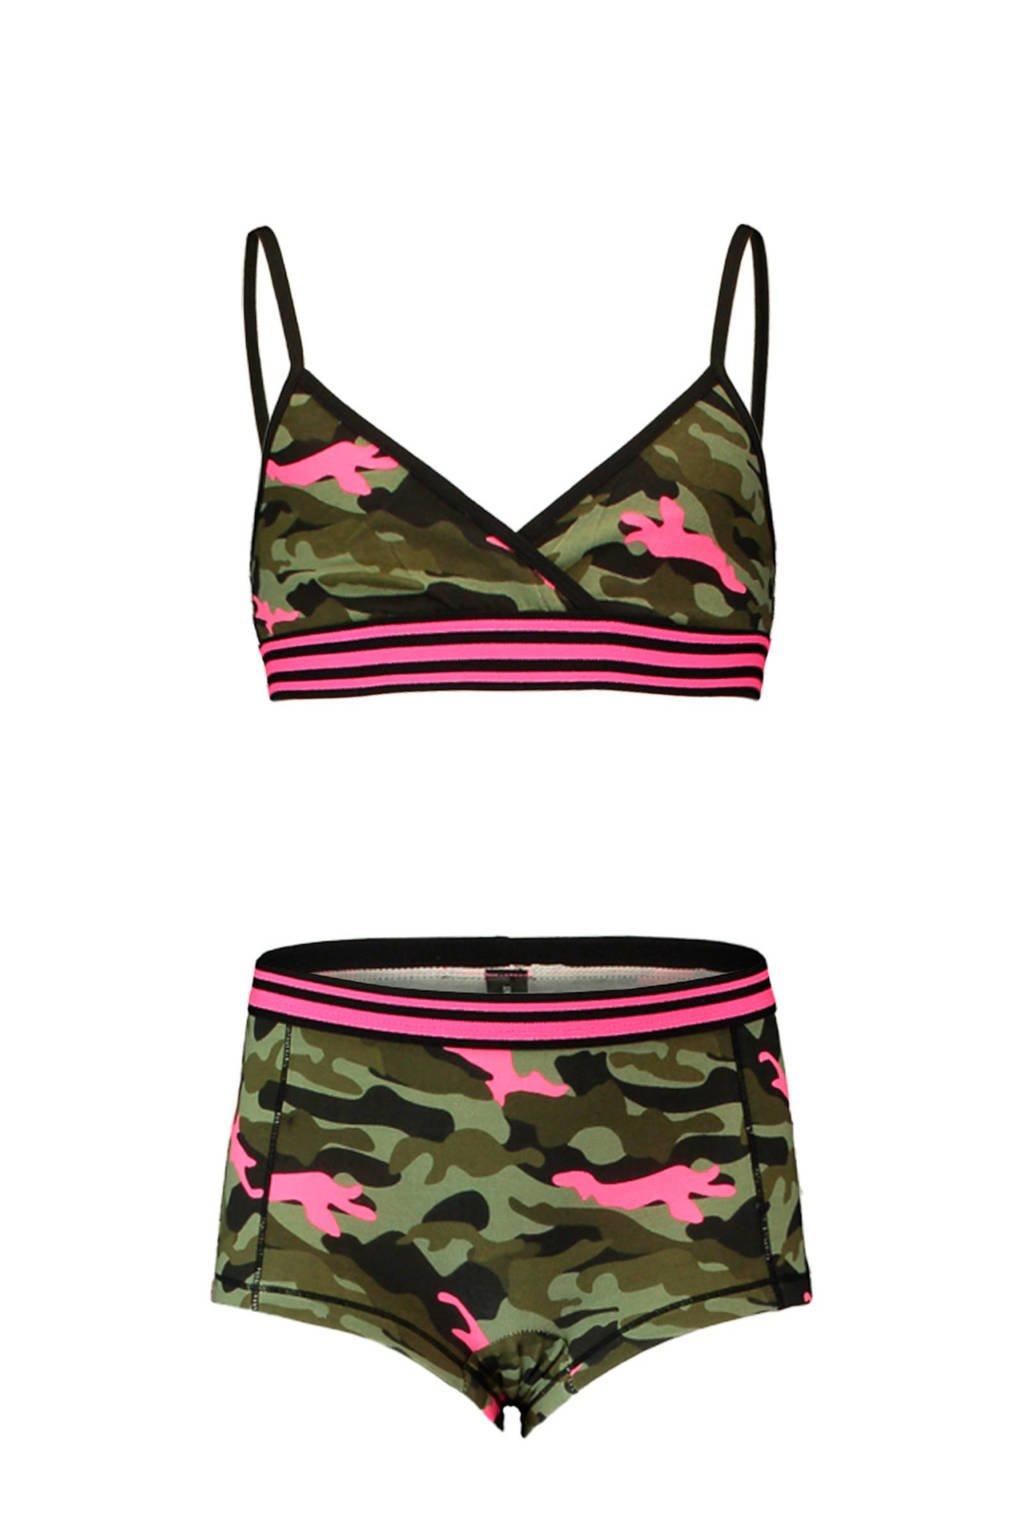 CoolCat bh-top + short, kaki/roze